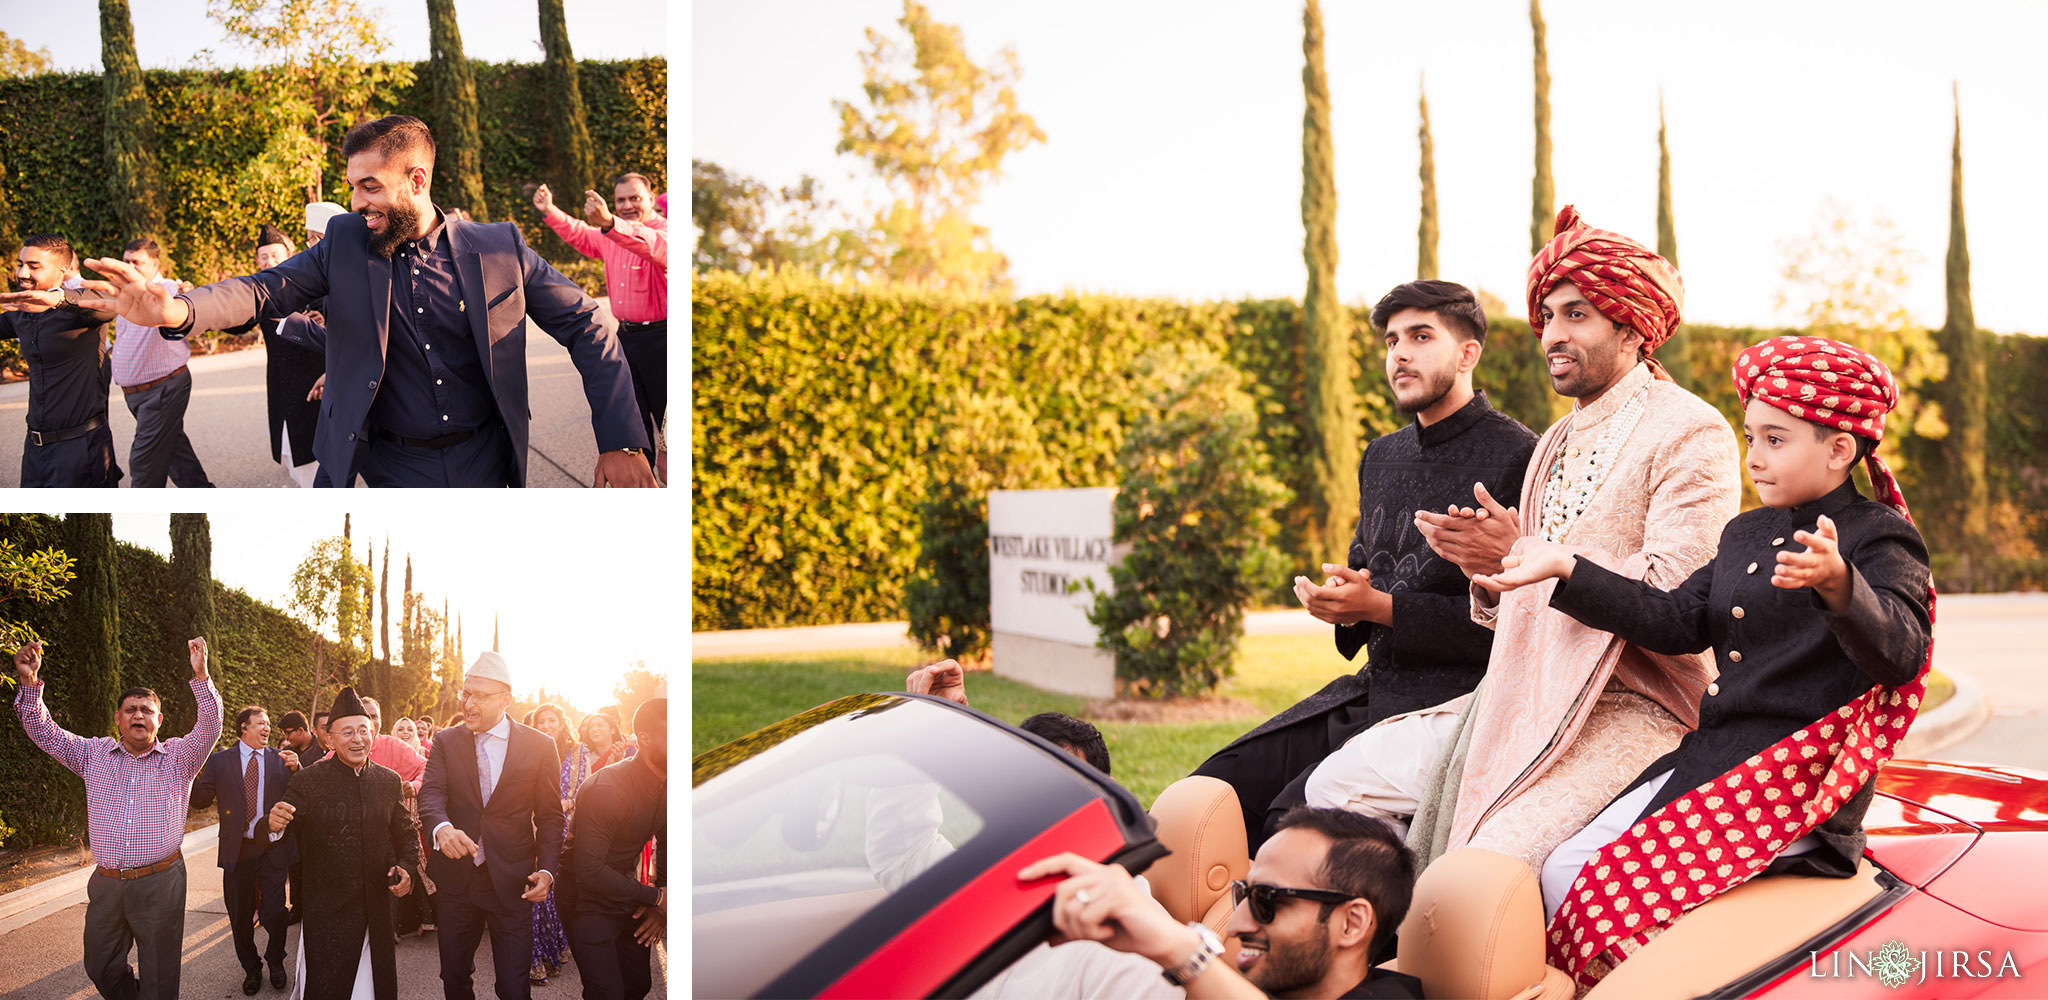 018 four seasons westlake village muslim wedding photography